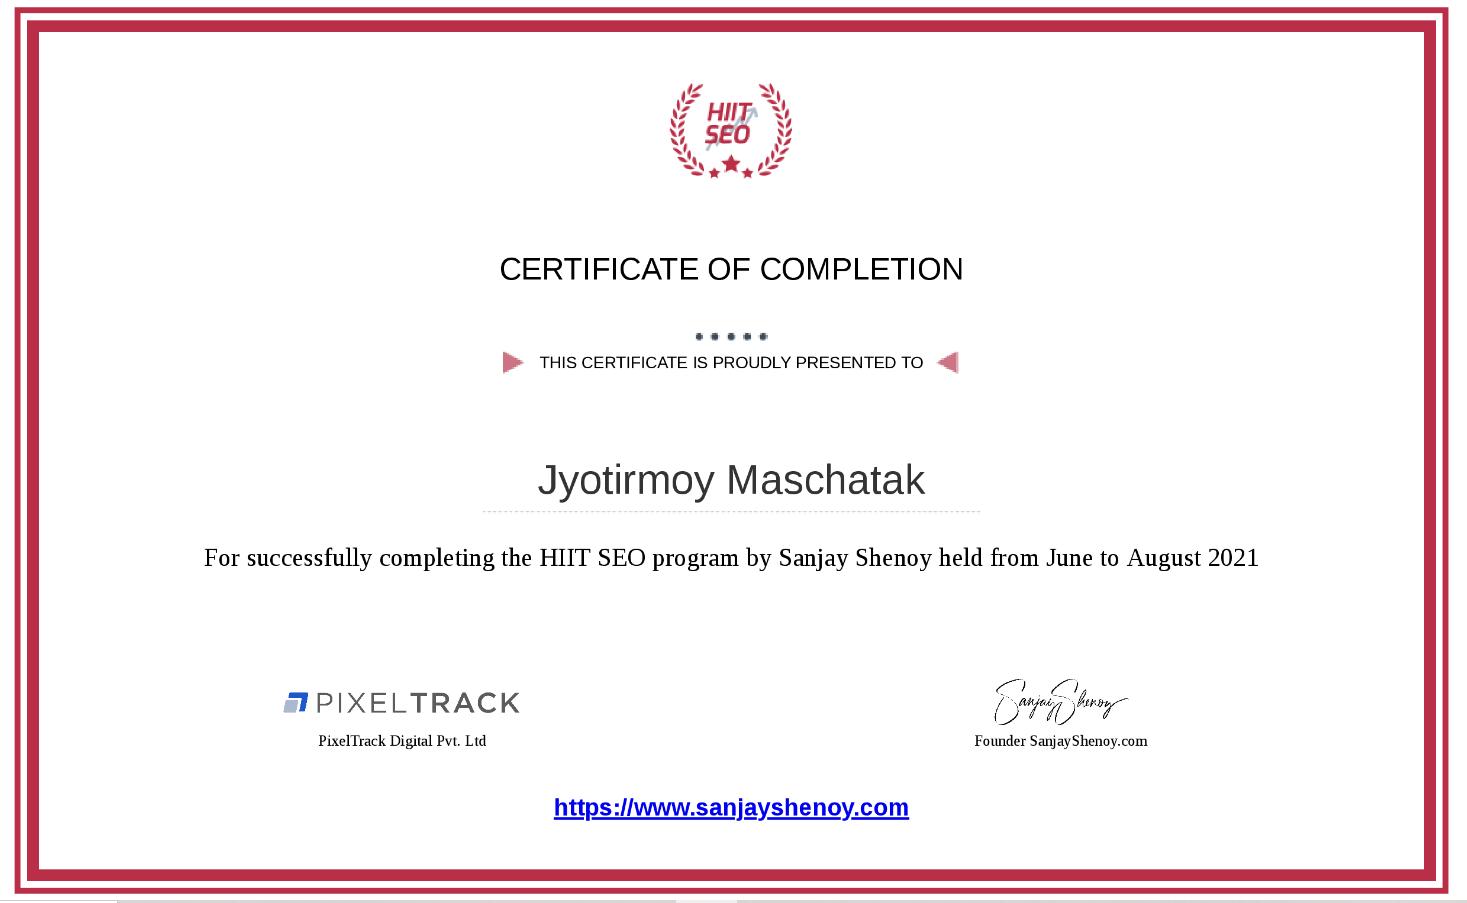 hiit seo blockchain verified certificate